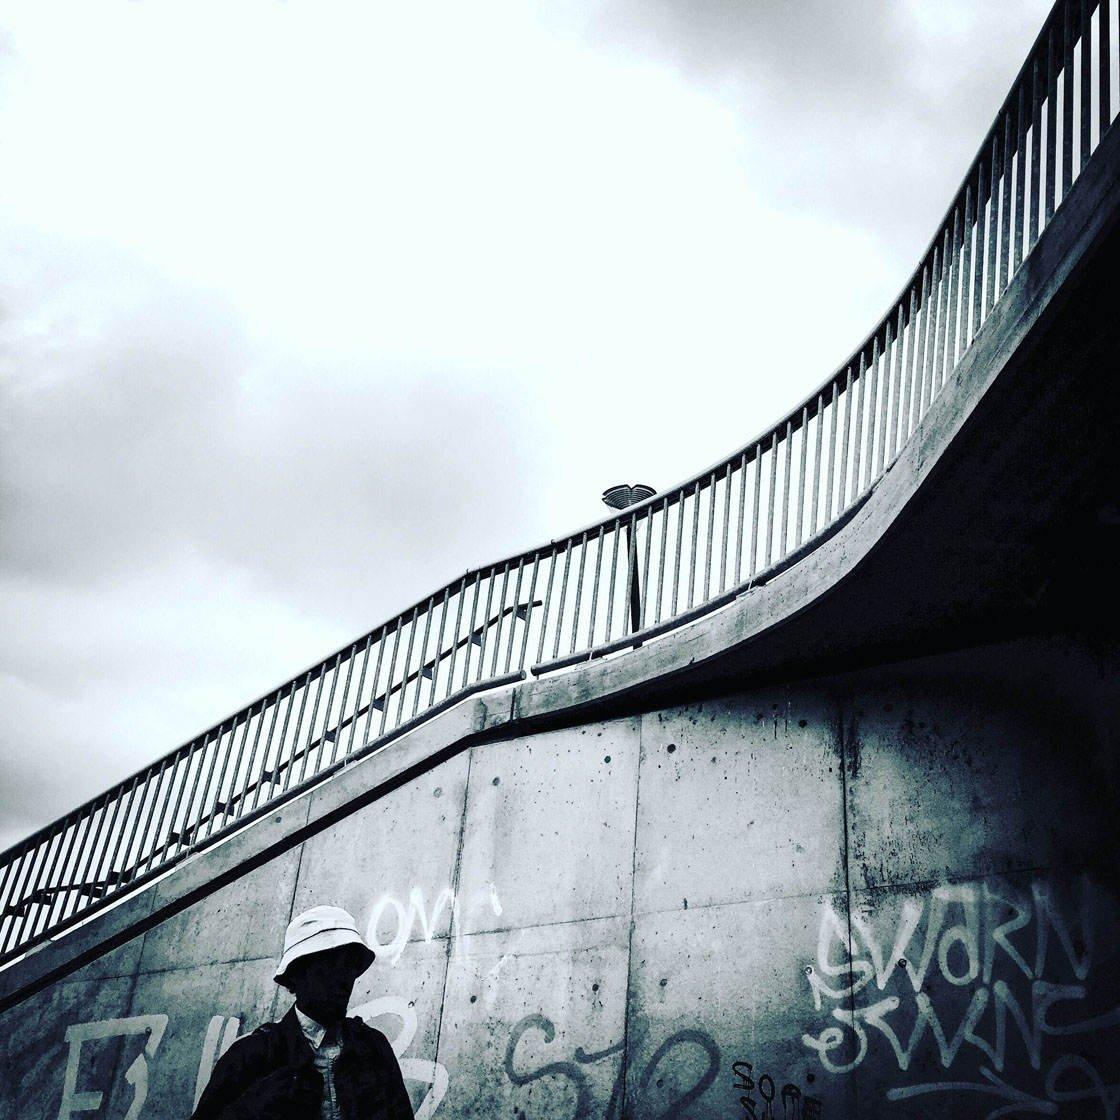 iPhone Street Photos Of Strangers 22 no script